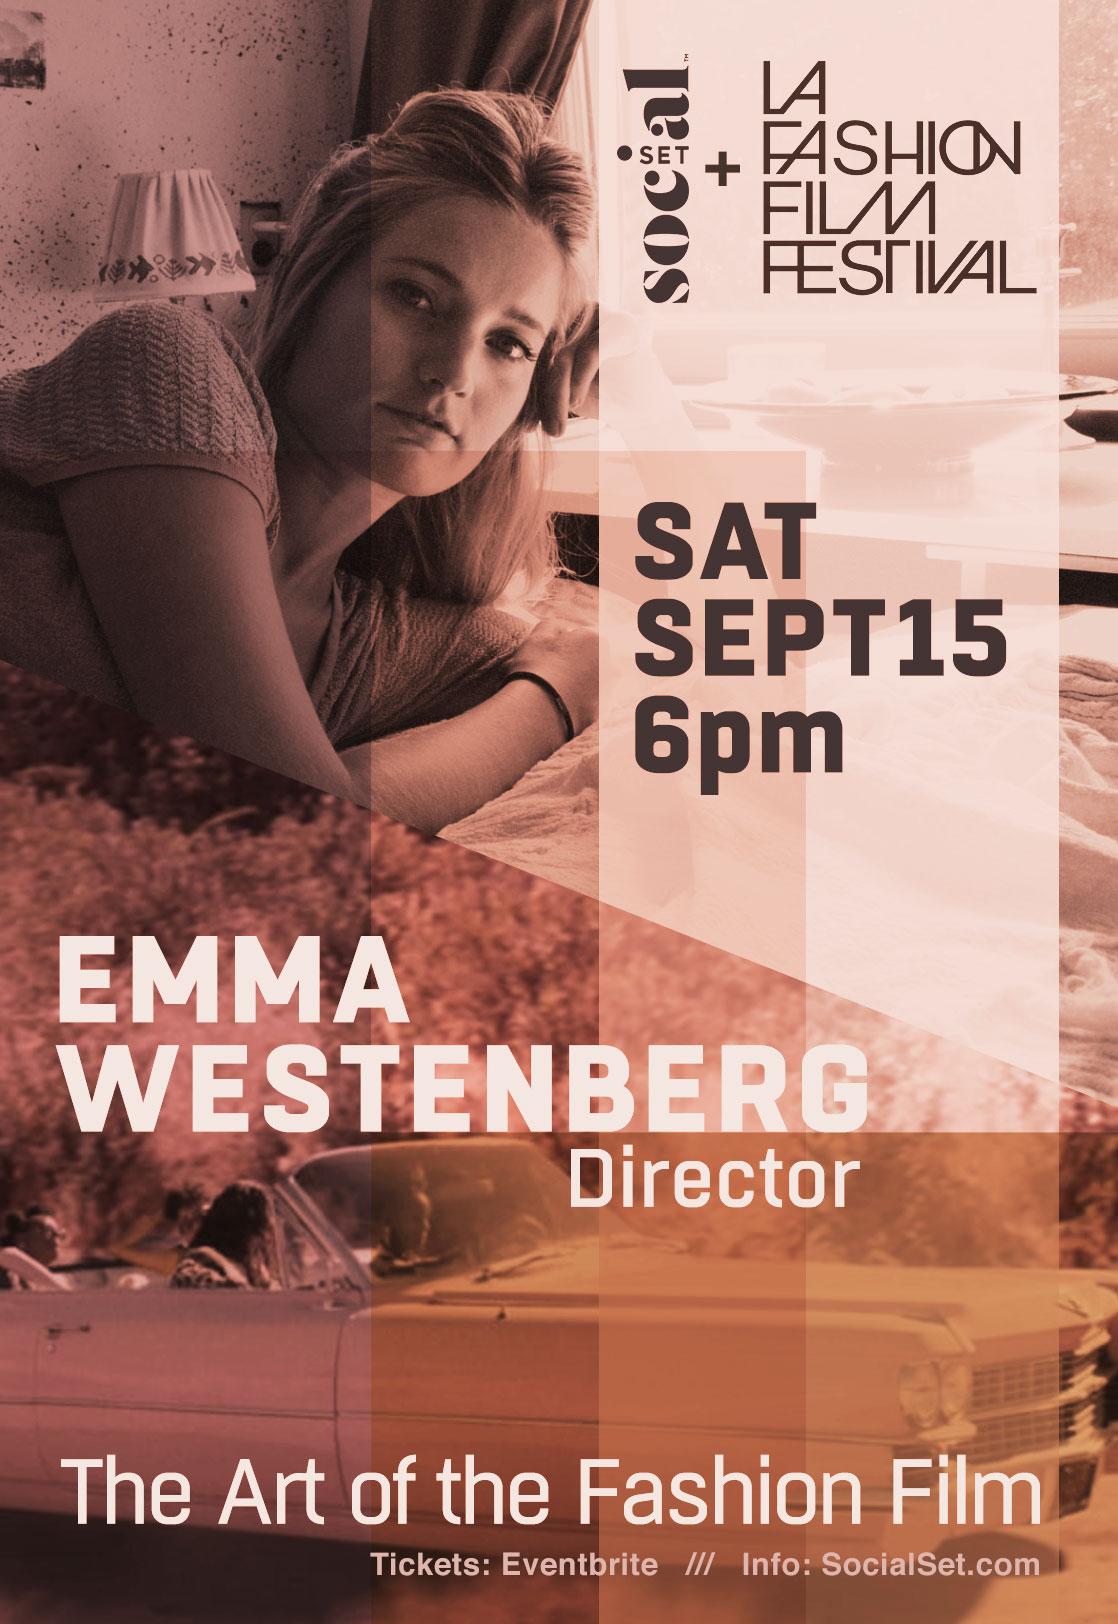 Emma-Westenberg-the-art-of-the-fashion-film.jpg